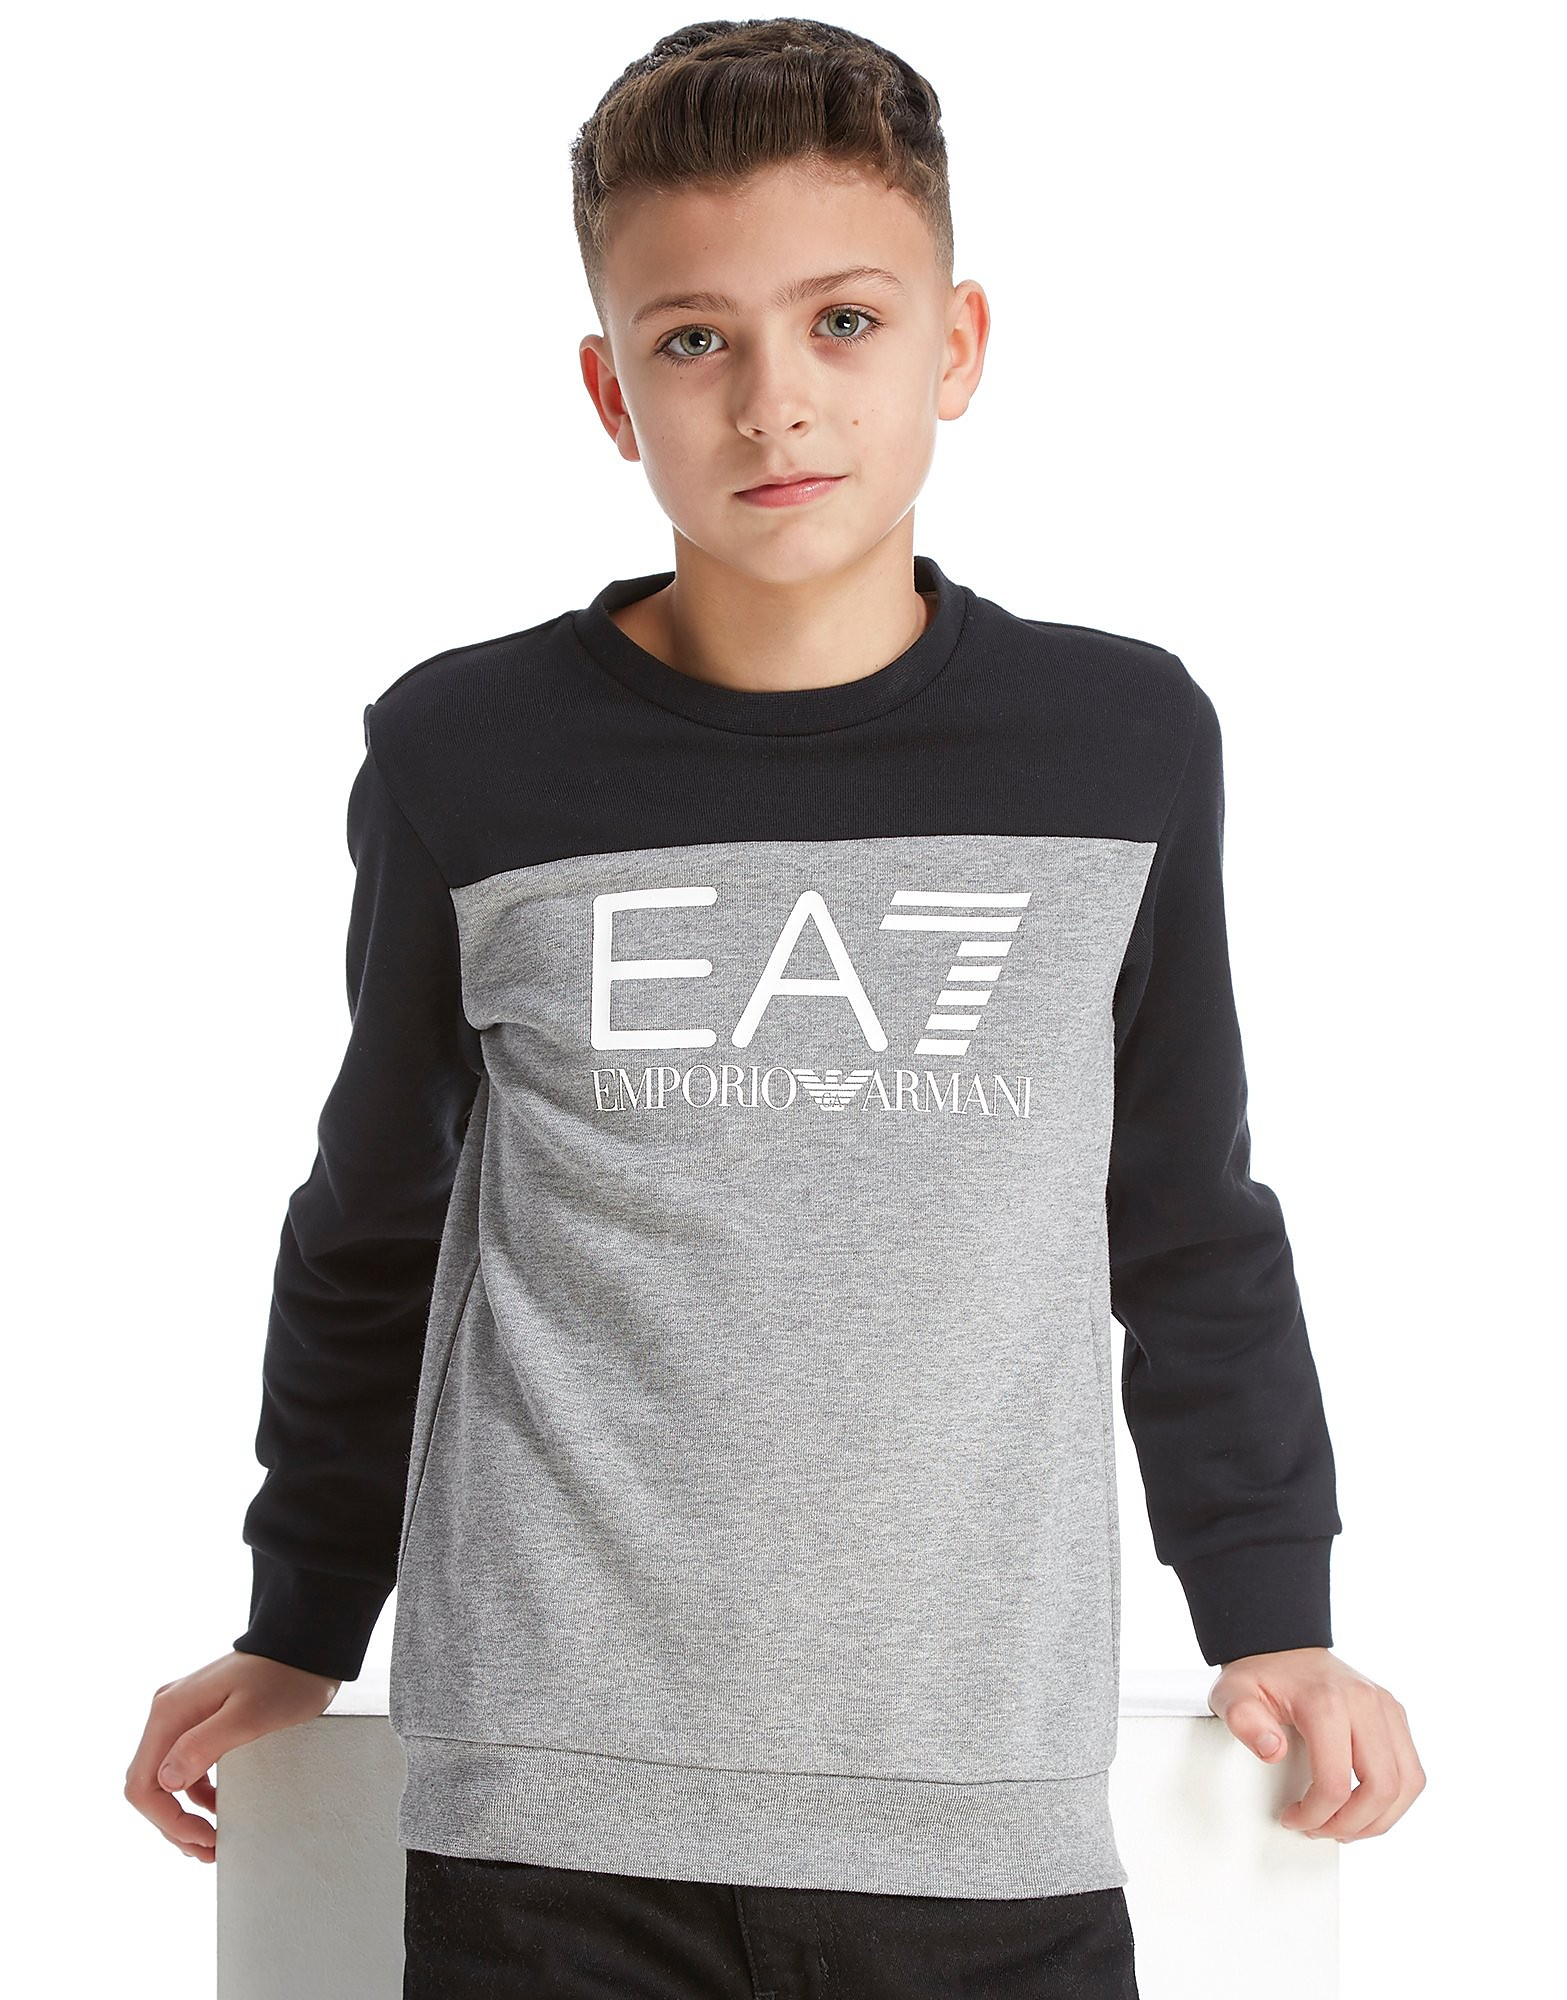 Emporio Armani EA7 Train Colourblock Crew Sweatshirt Junior